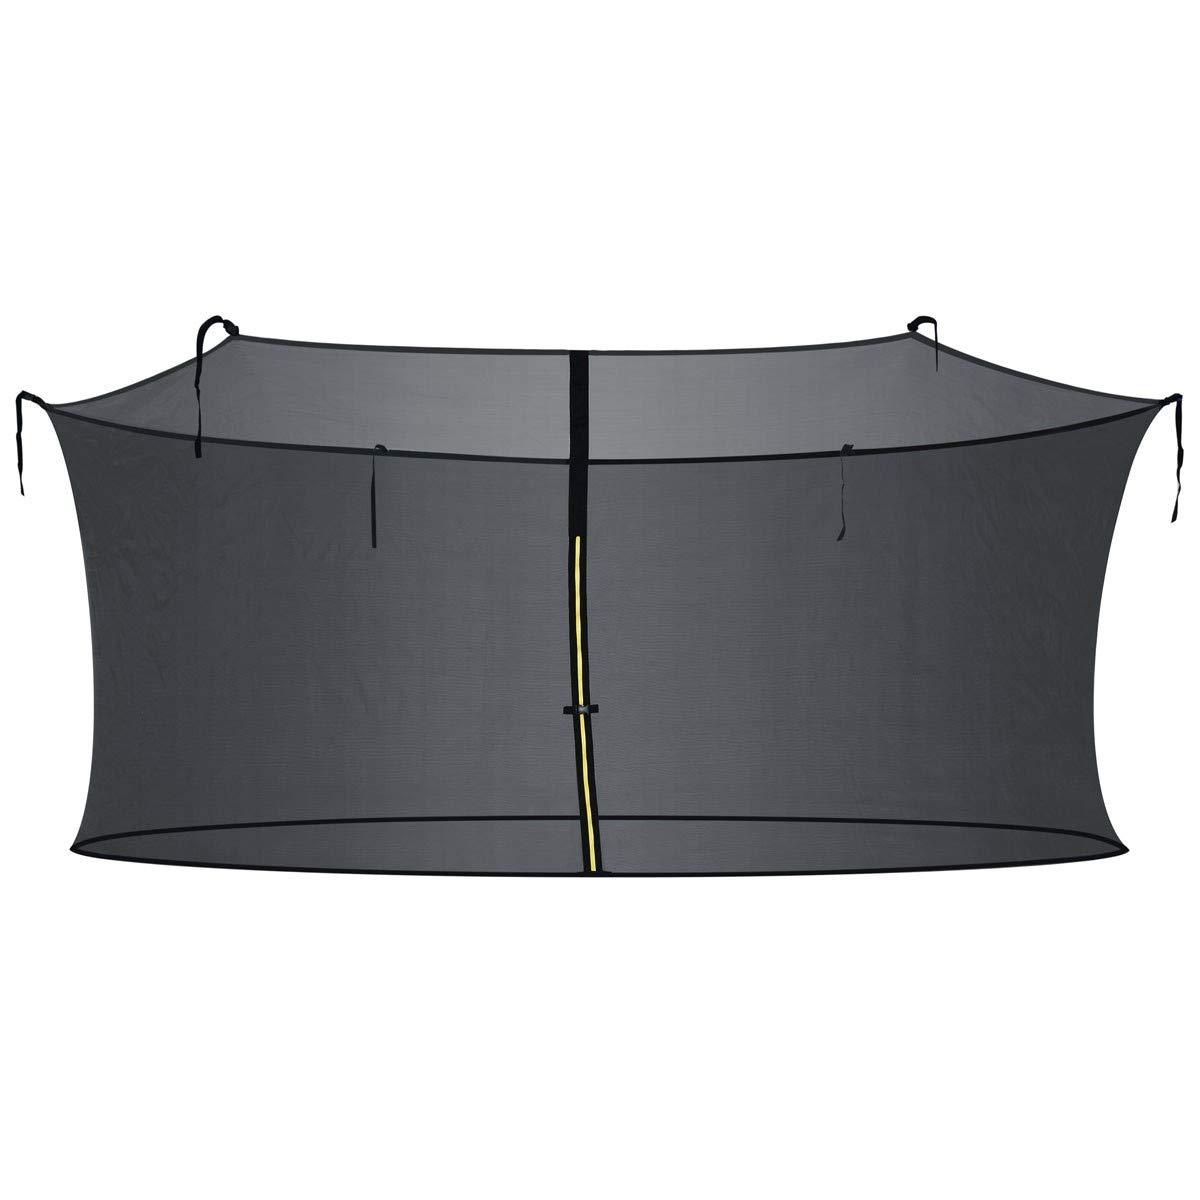 Zupapa 15FT 14FT 12FT 10FT Trampoline Inside-Enclosure net Replacement Black Mesh (12FT)